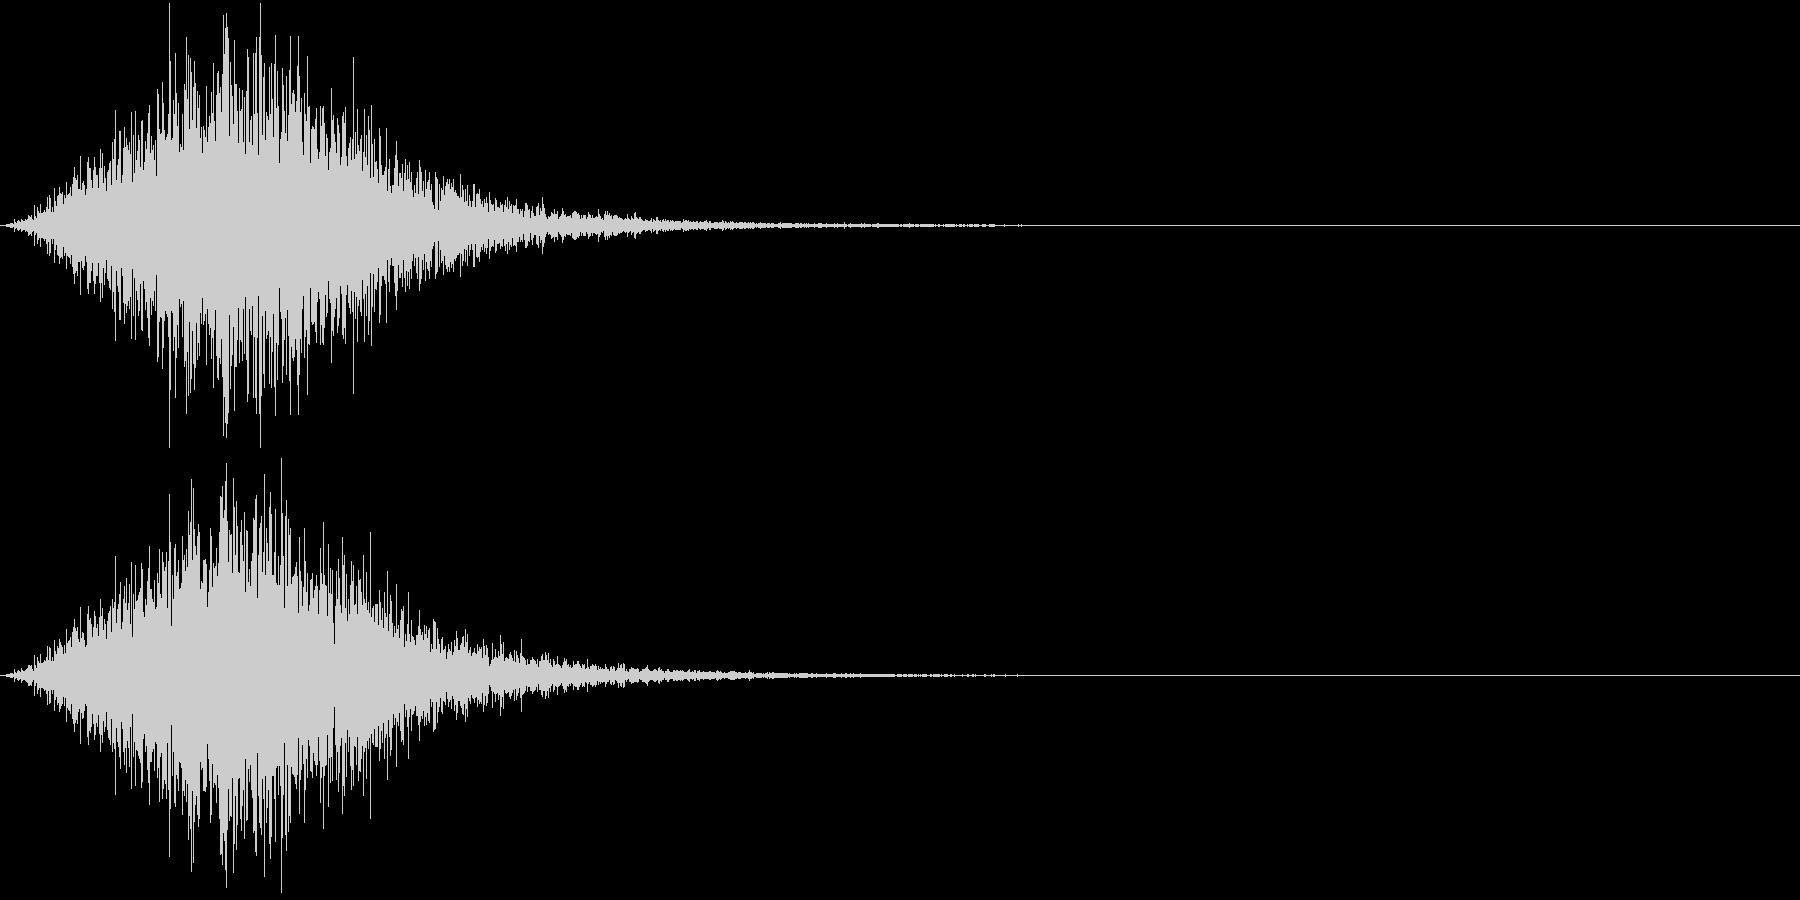 Battle 戦闘エフェクト音 13の未再生の波形